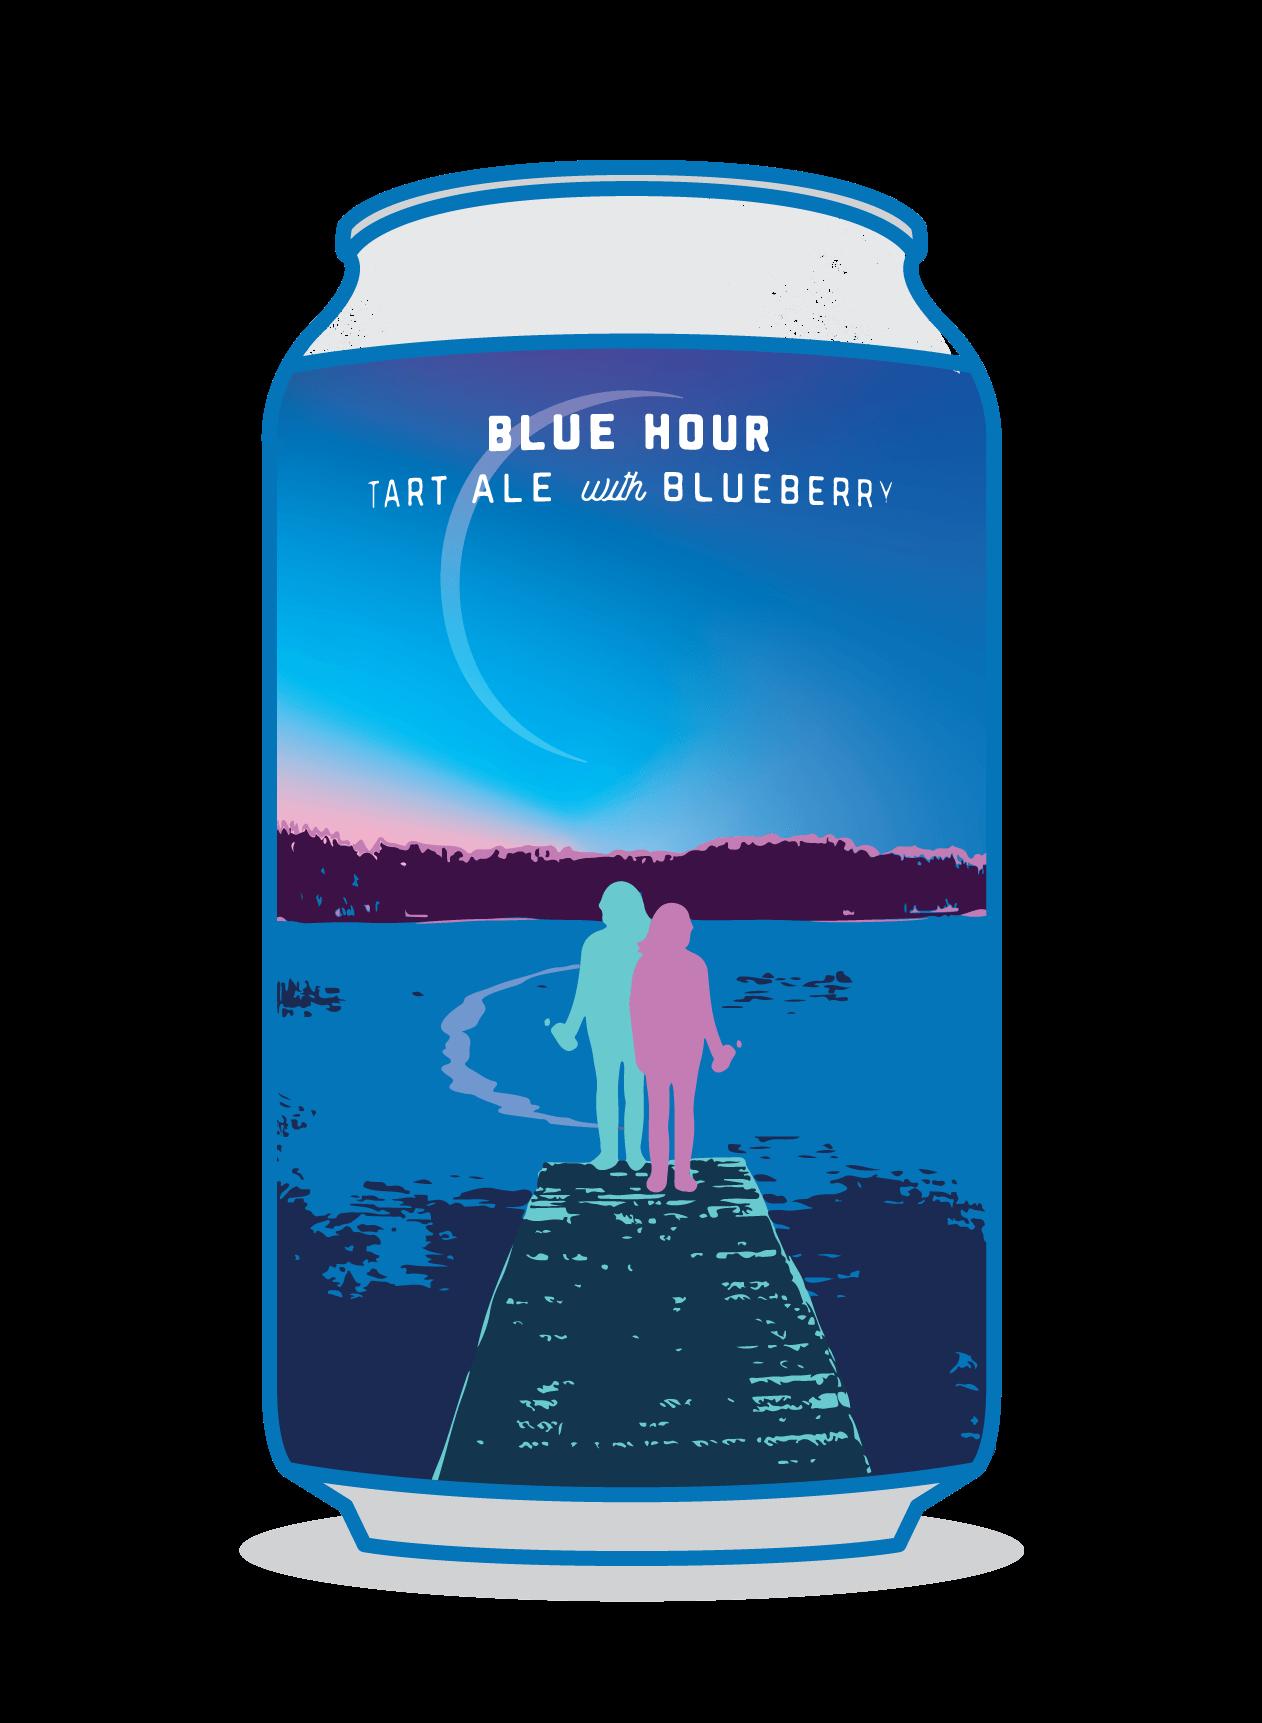 Blue Hour Image